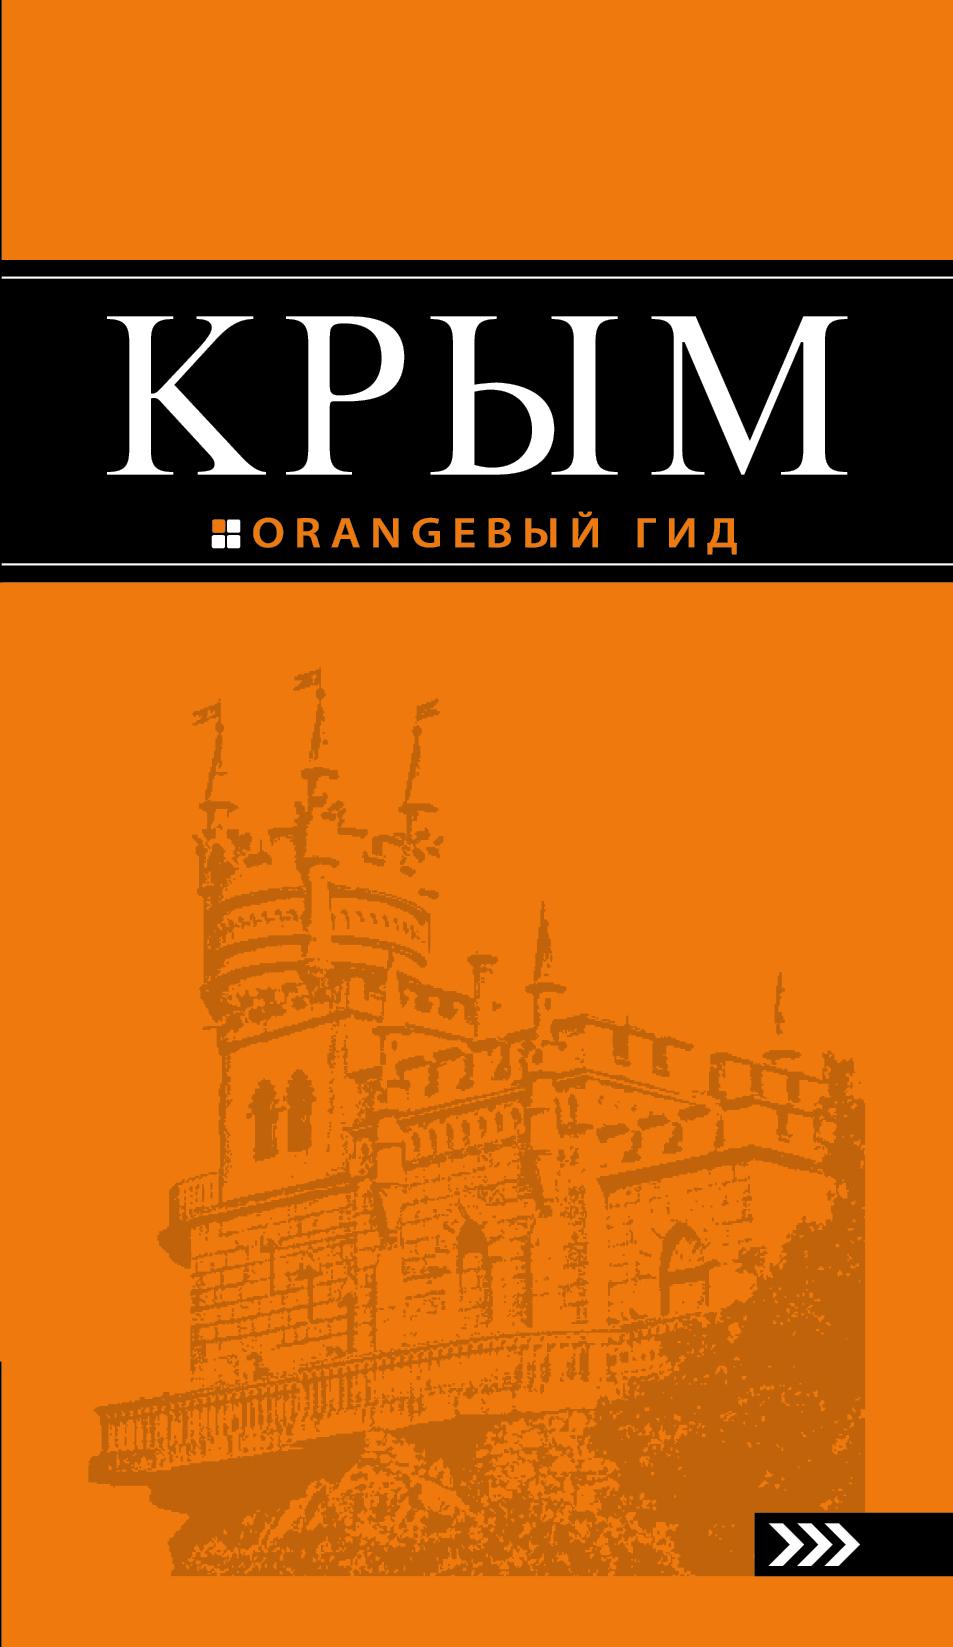 Дмитрий Киселев Крым. Путеводитель крым путеводитель карта